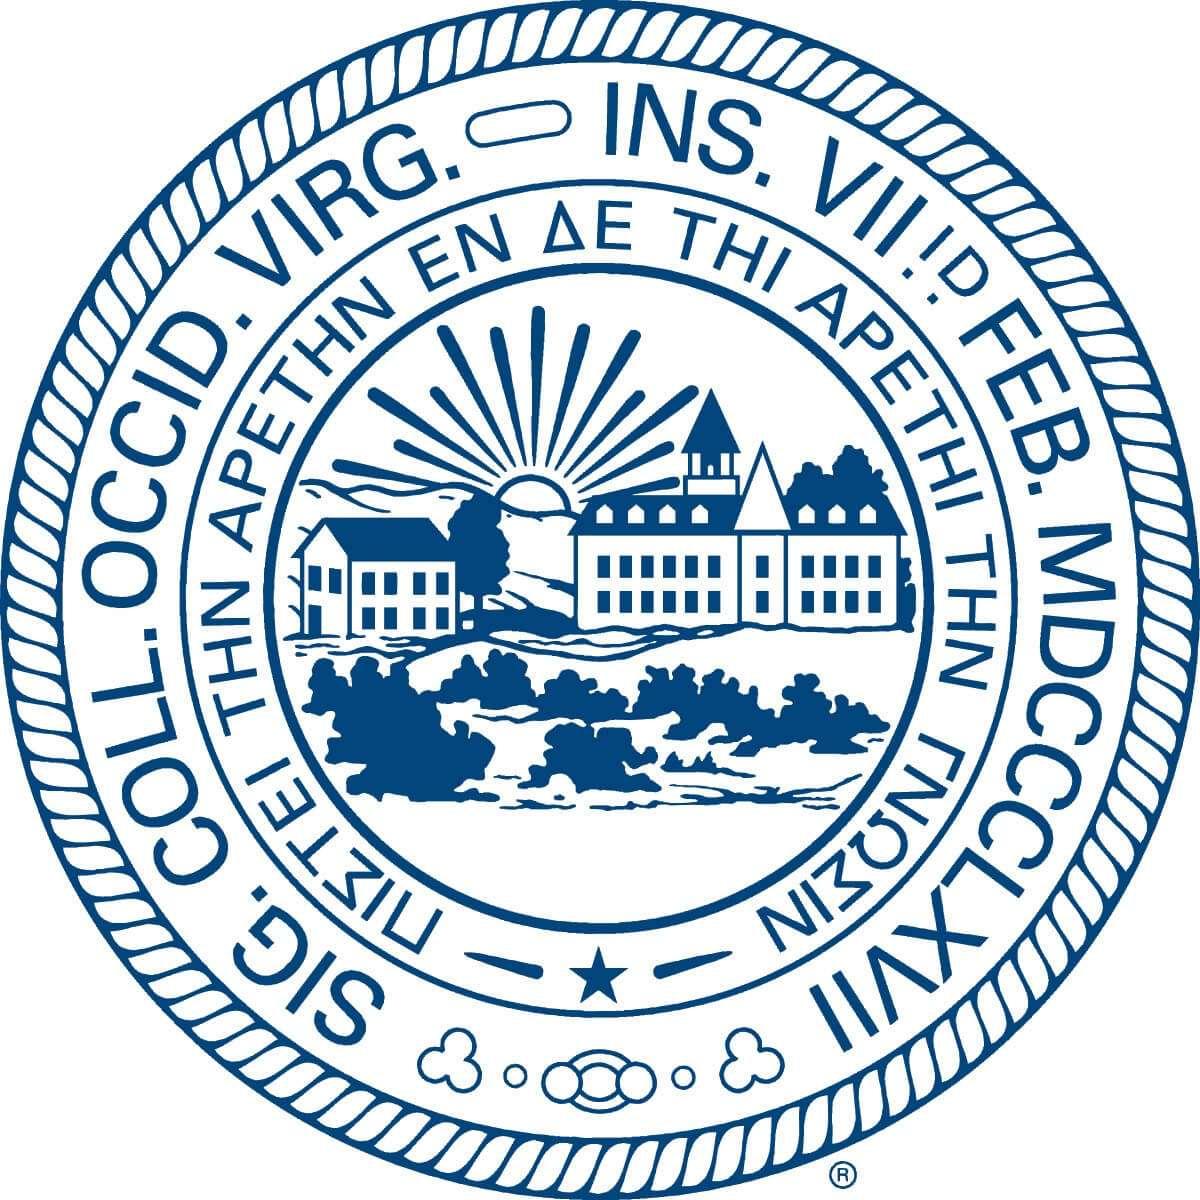 West-Virginia-University-WVU-Seal